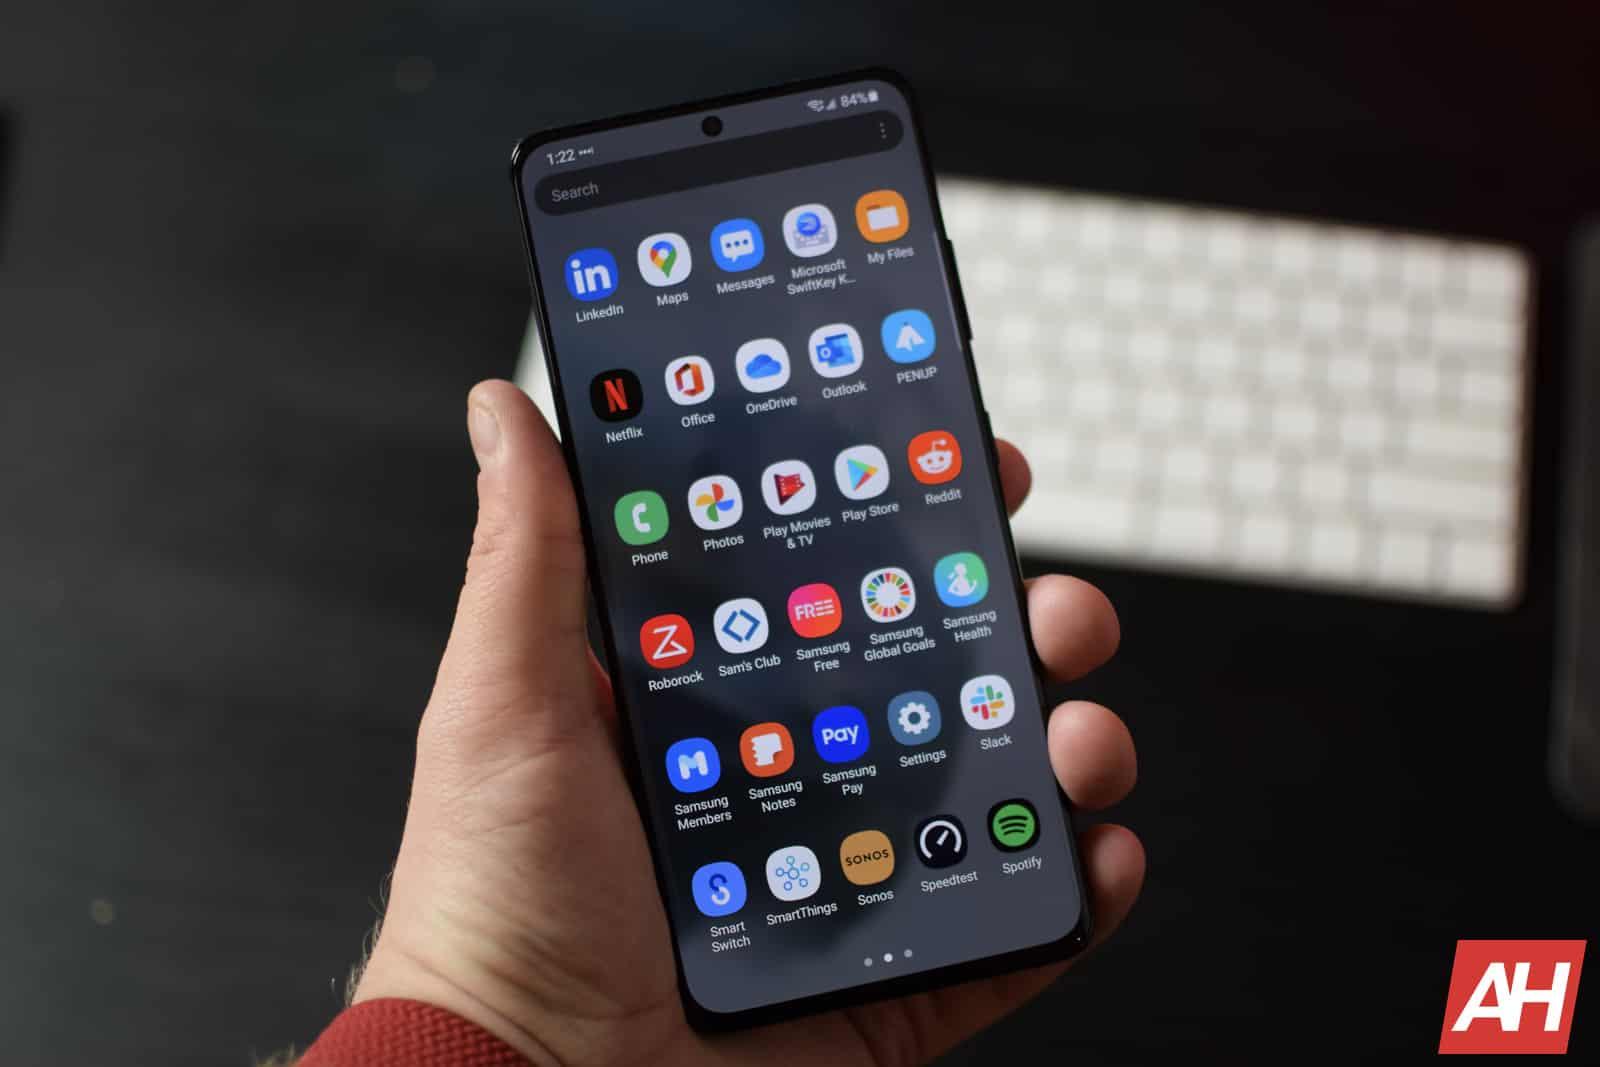 Samsung Galaxy S21 Ultra AH 03